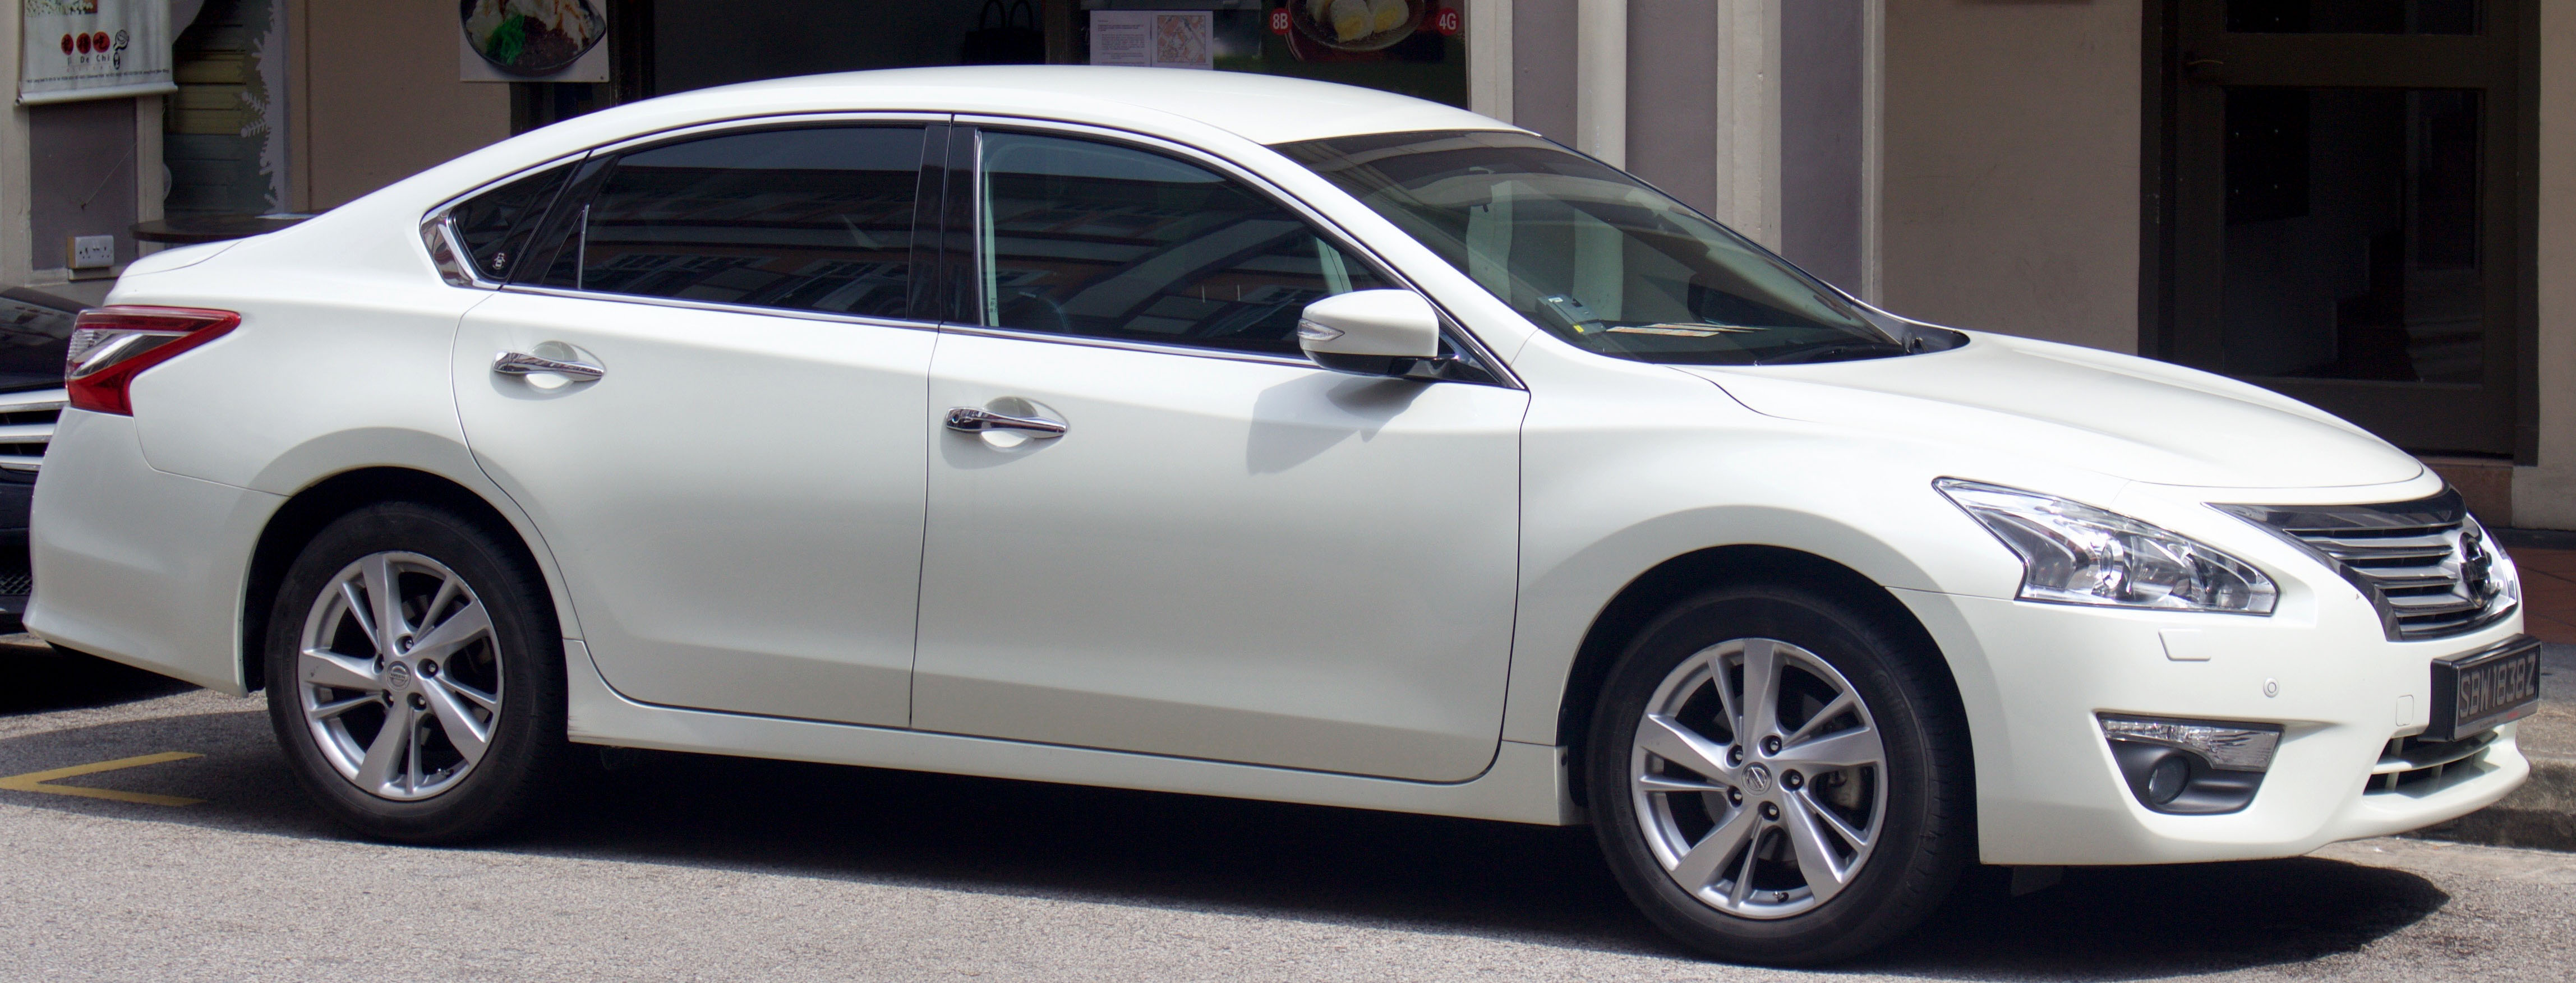 File:2014 Nissan Teana (L33) 2.0XL sedan (2016-01-06) 01 ...